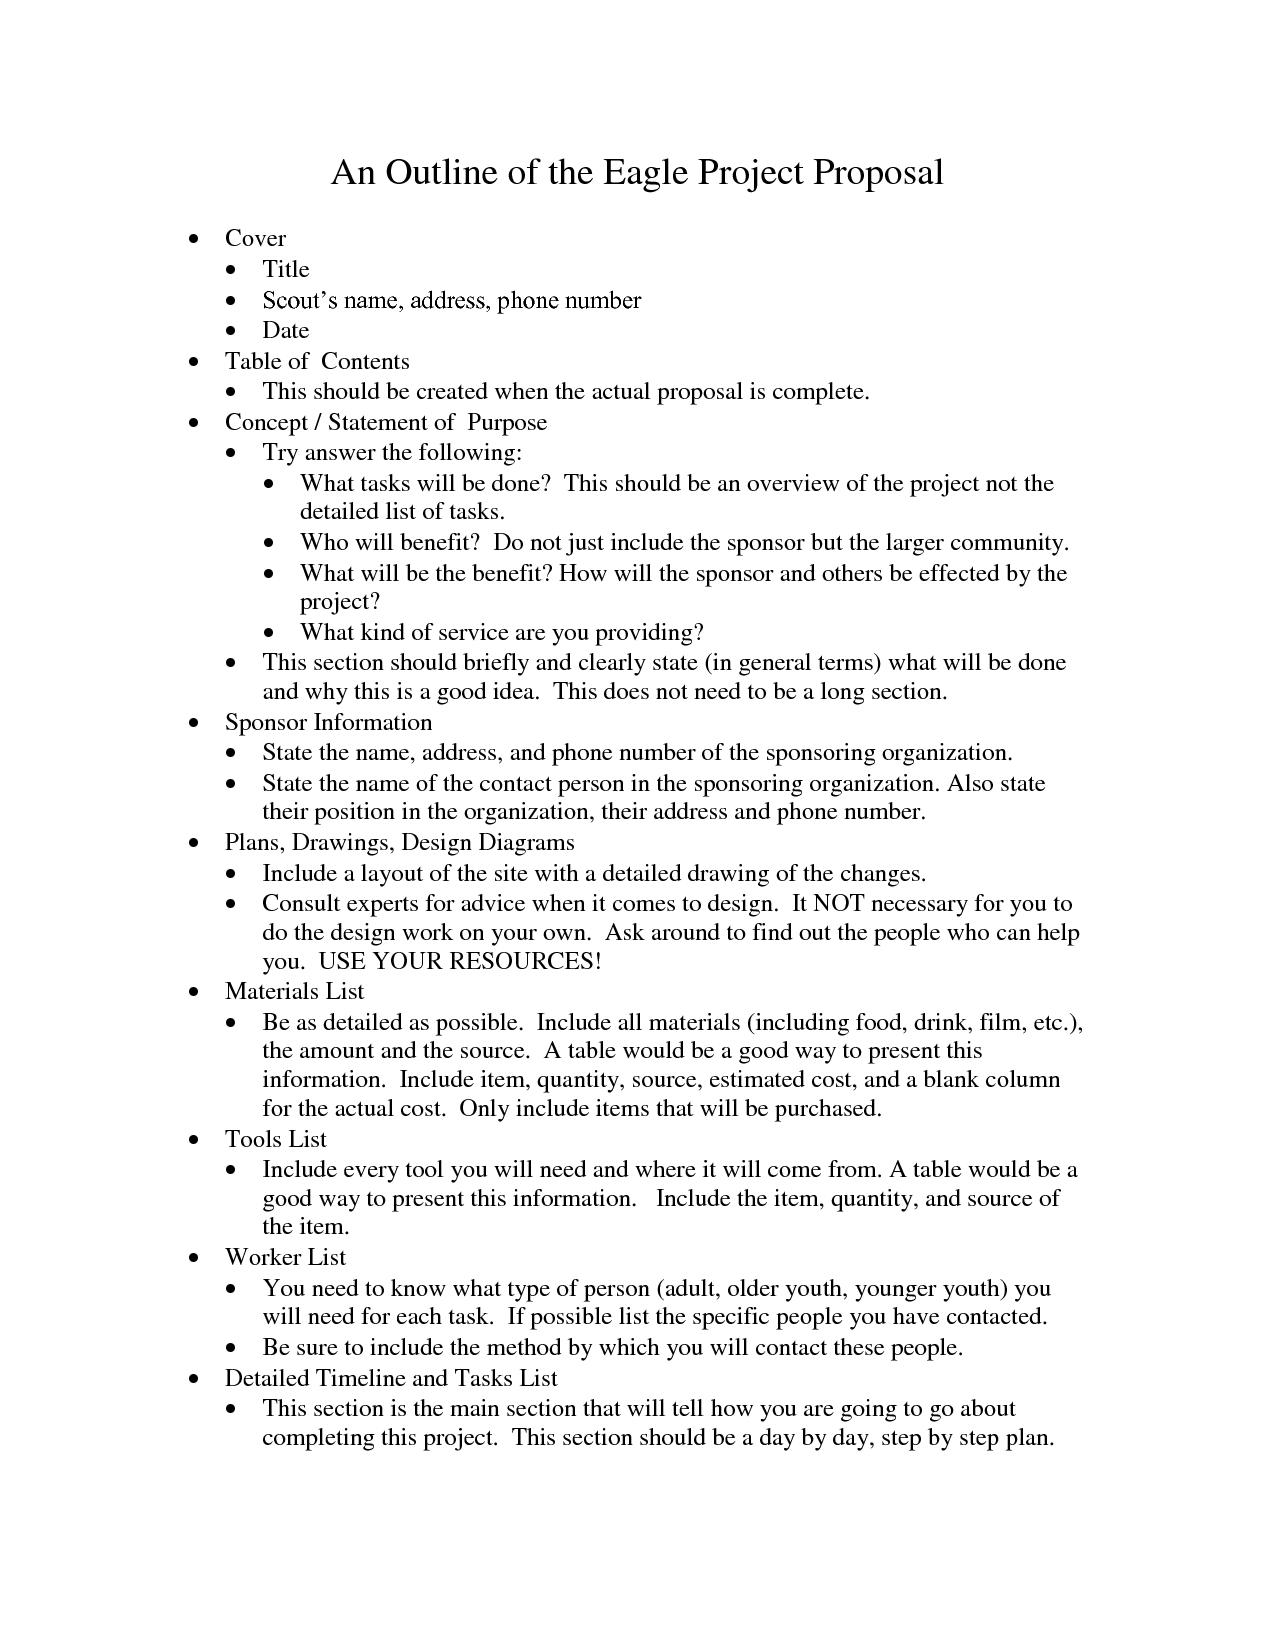 10 Cute Eagle Scout Service Project Ideas eagle project template daway dabrowa co 2021